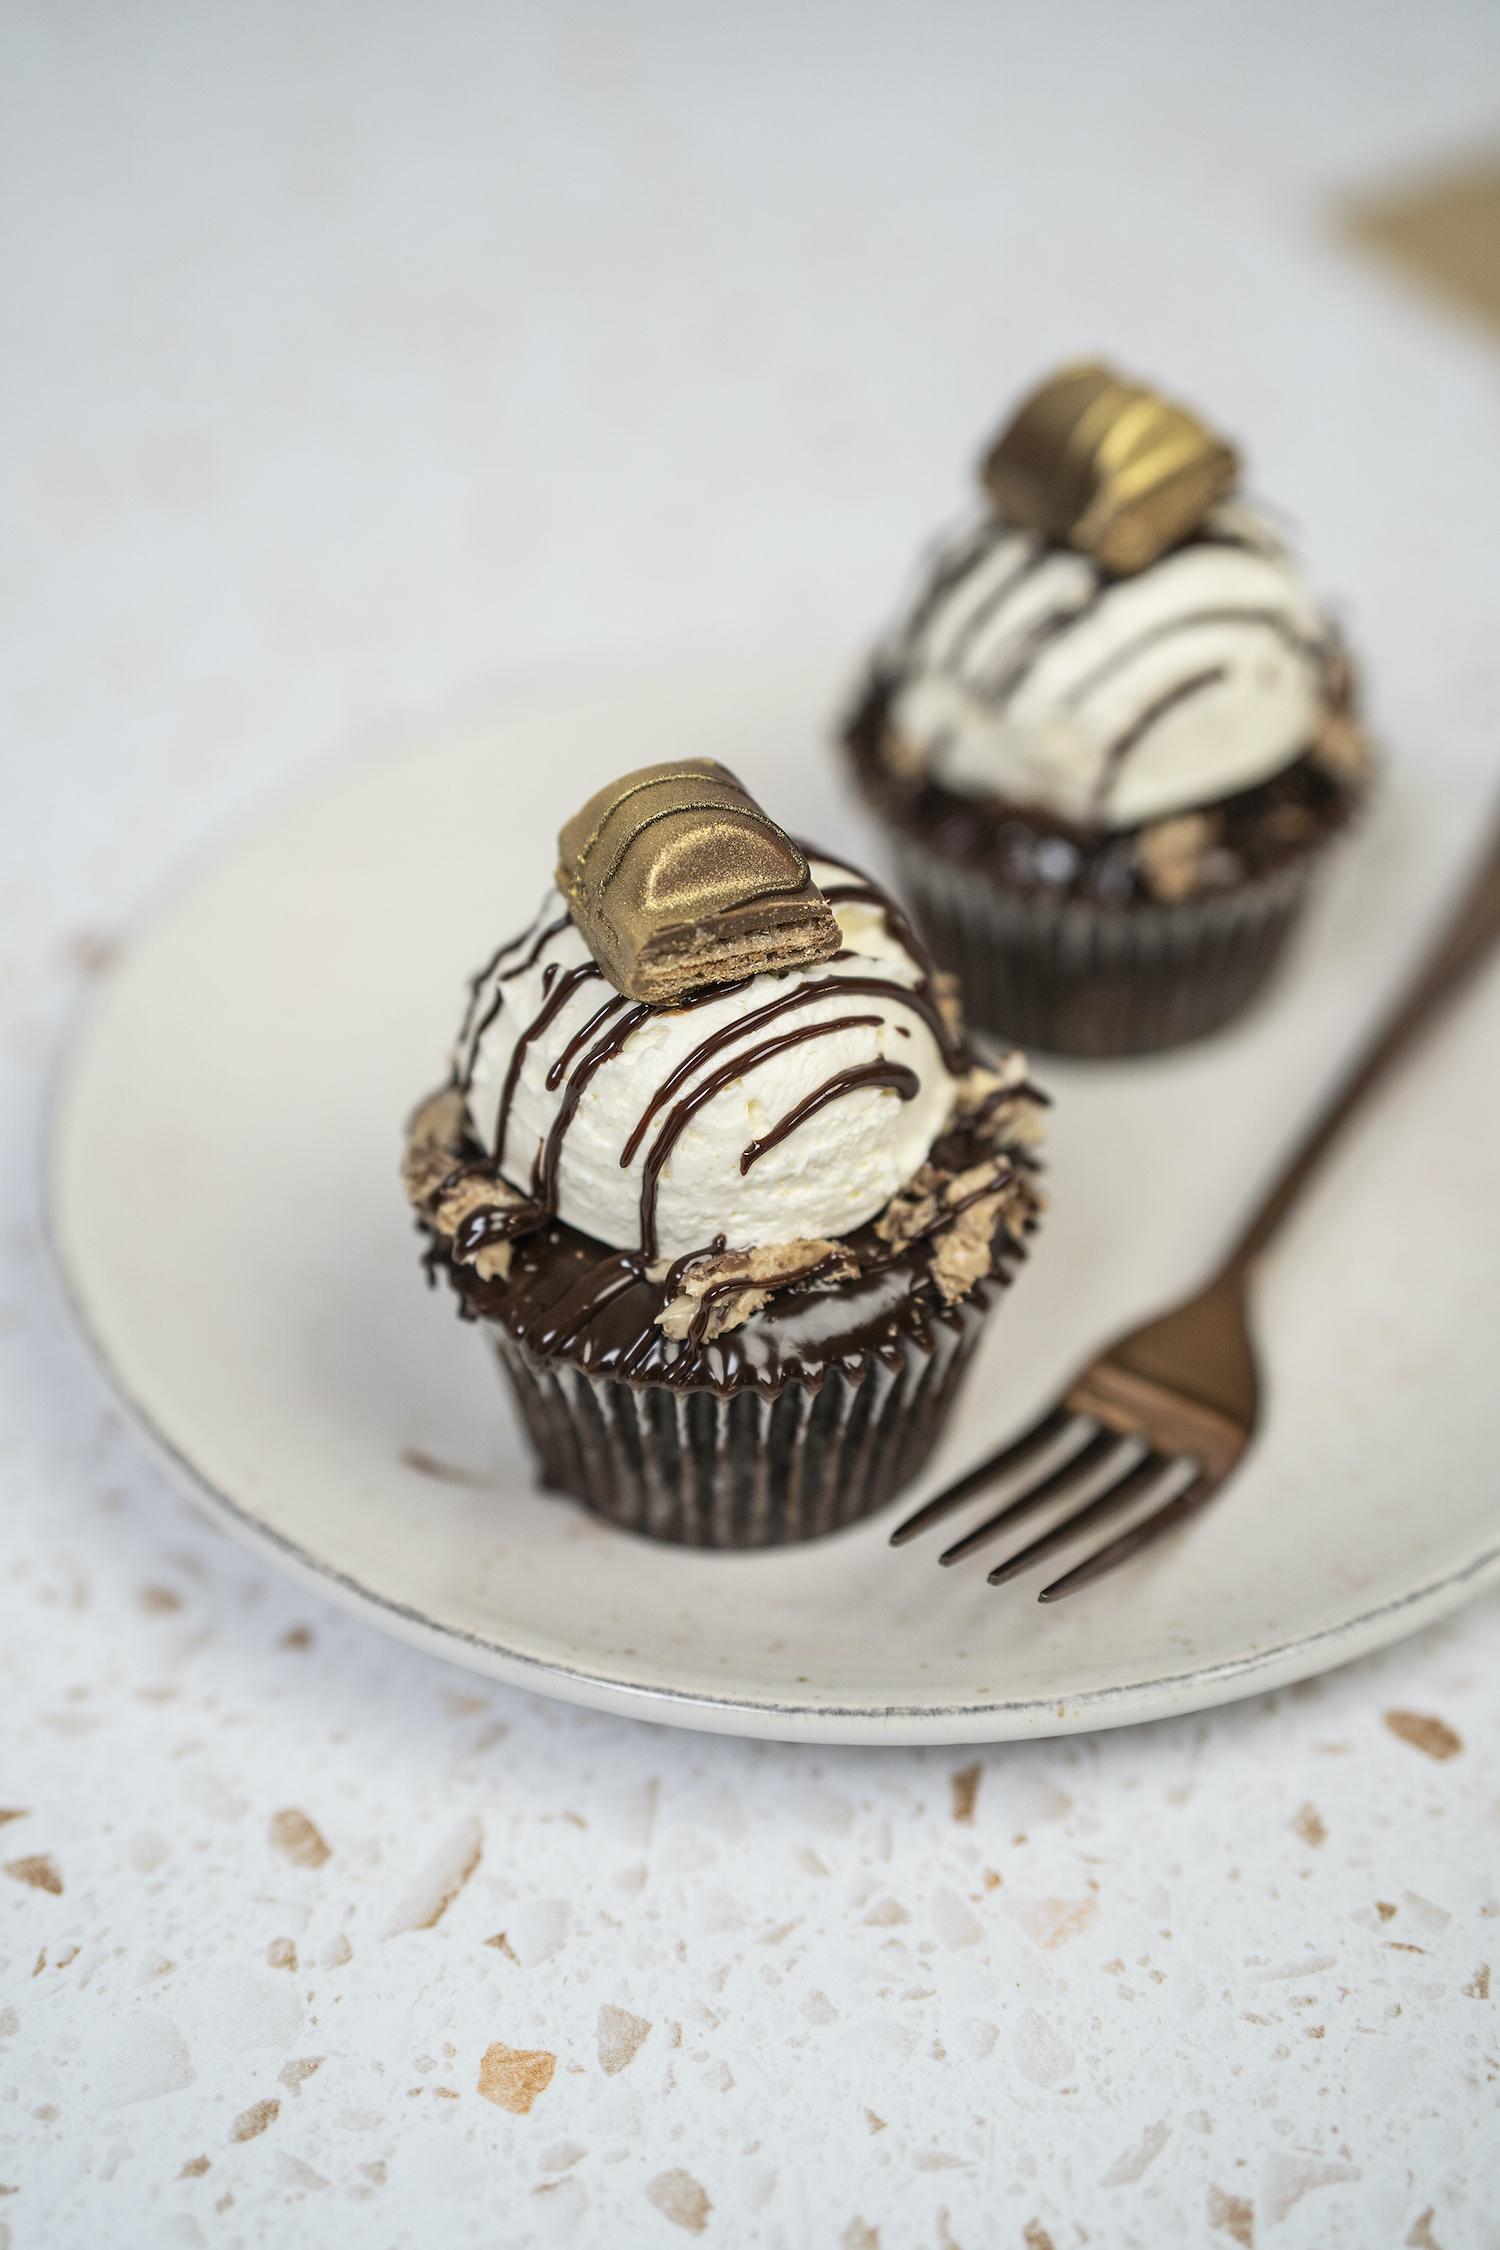 Flavourtown Bakery   Multi-Award Winning London Bakery   Humphrey Munson Blog